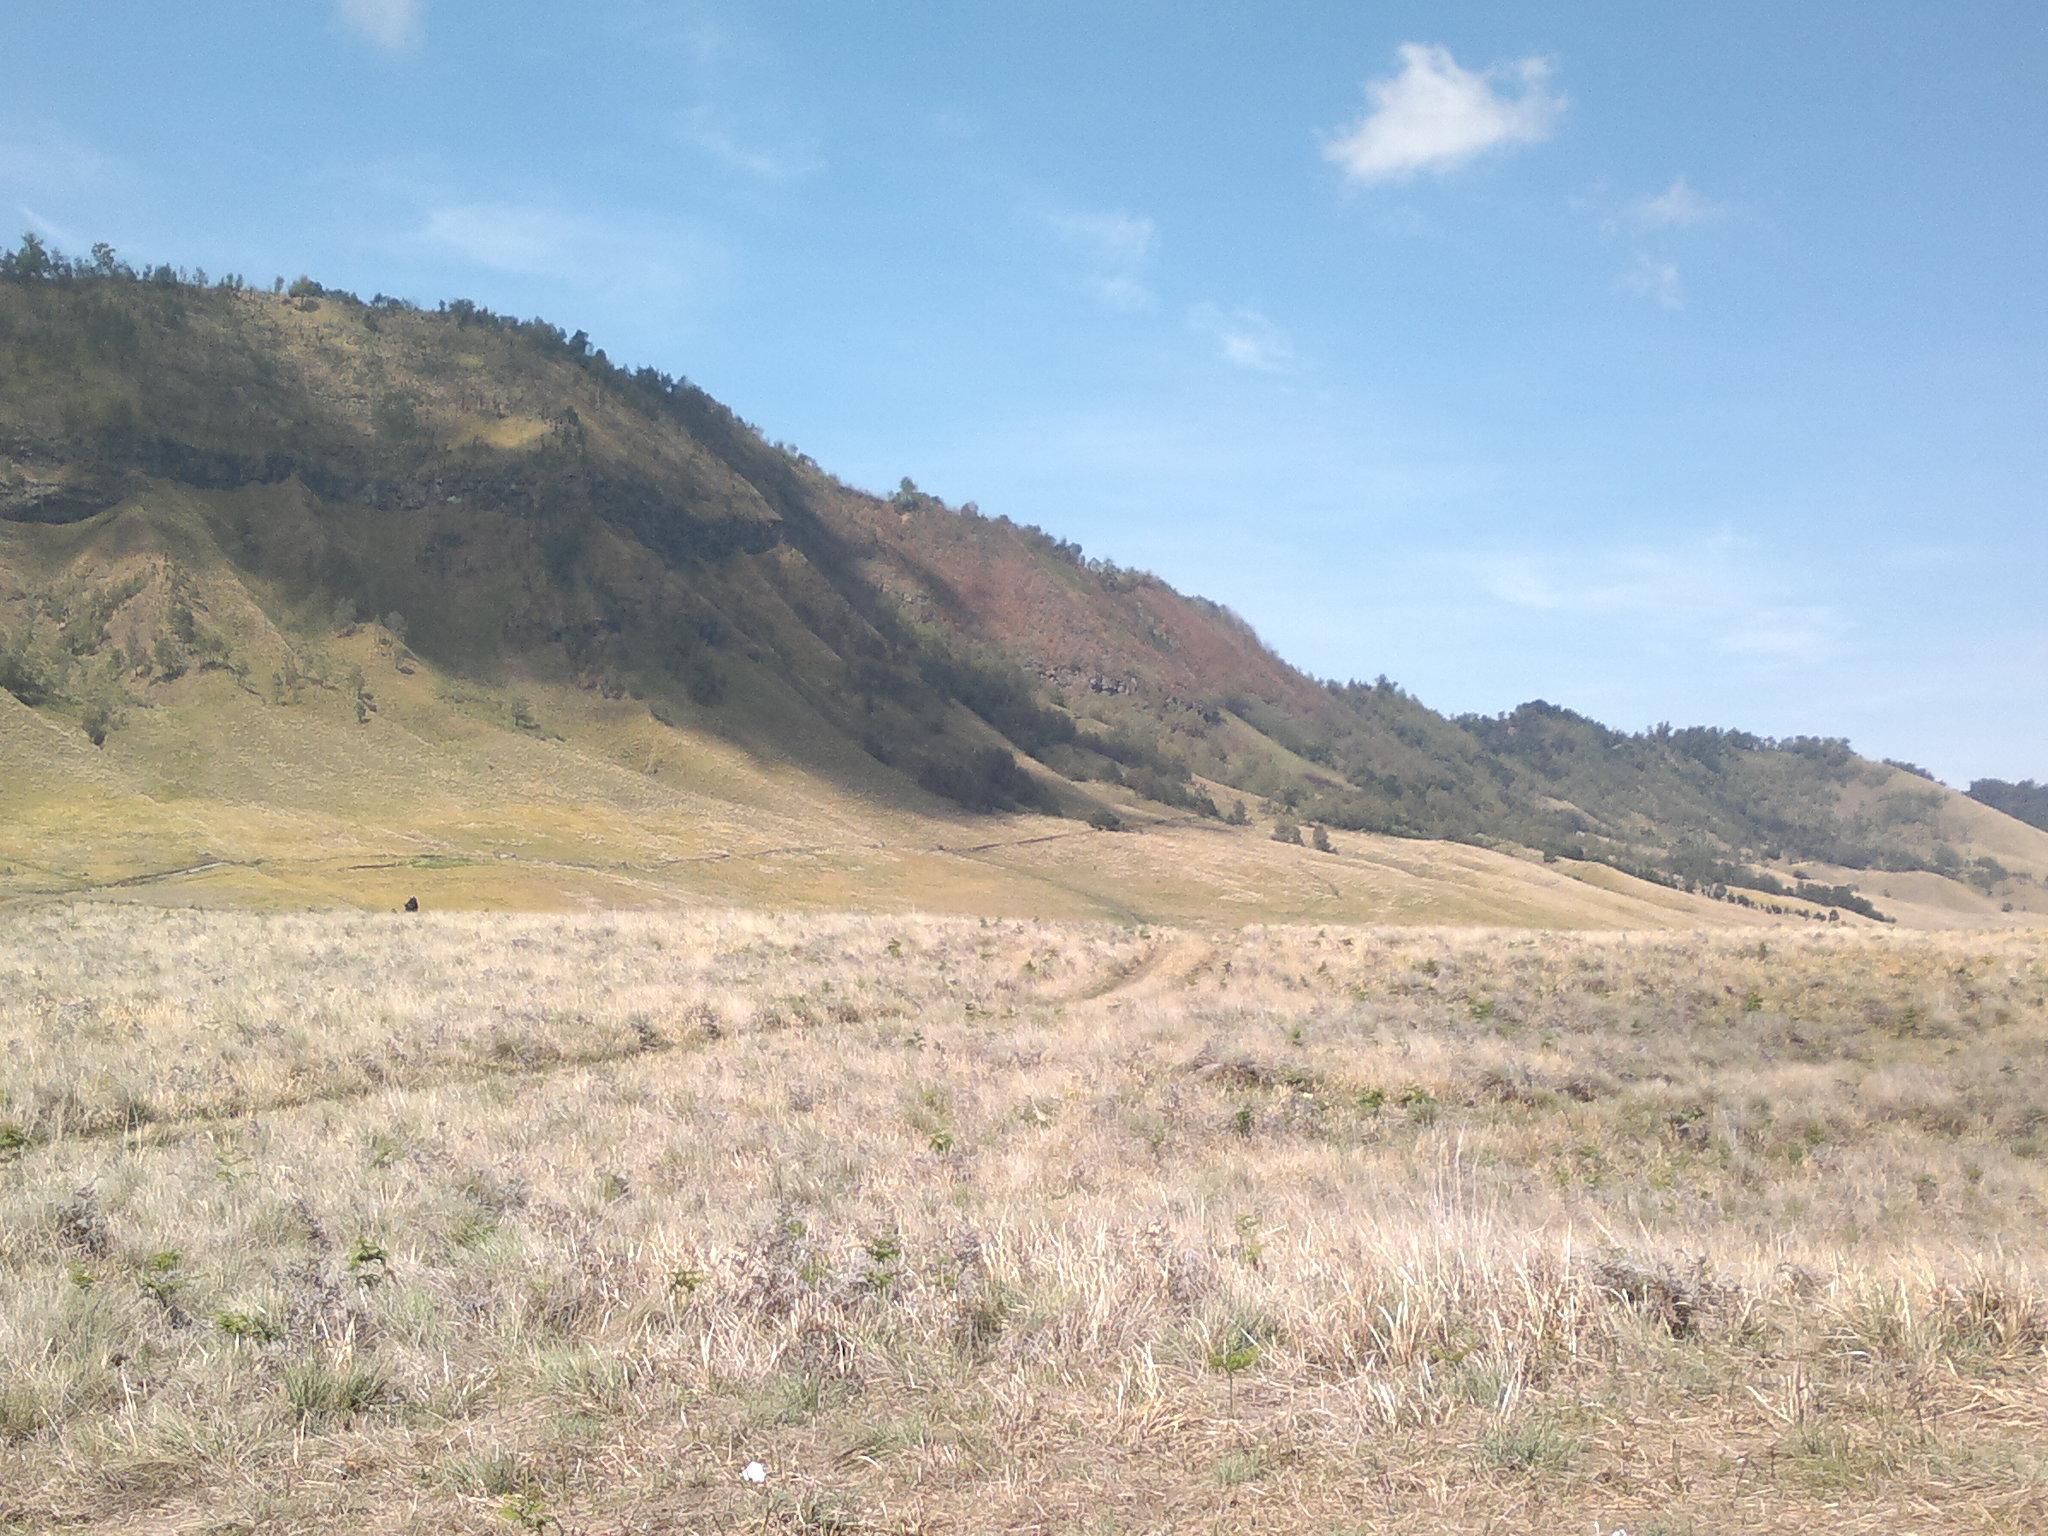 File:Savanna Di Balik Gng Bromo - panoramio.jpg